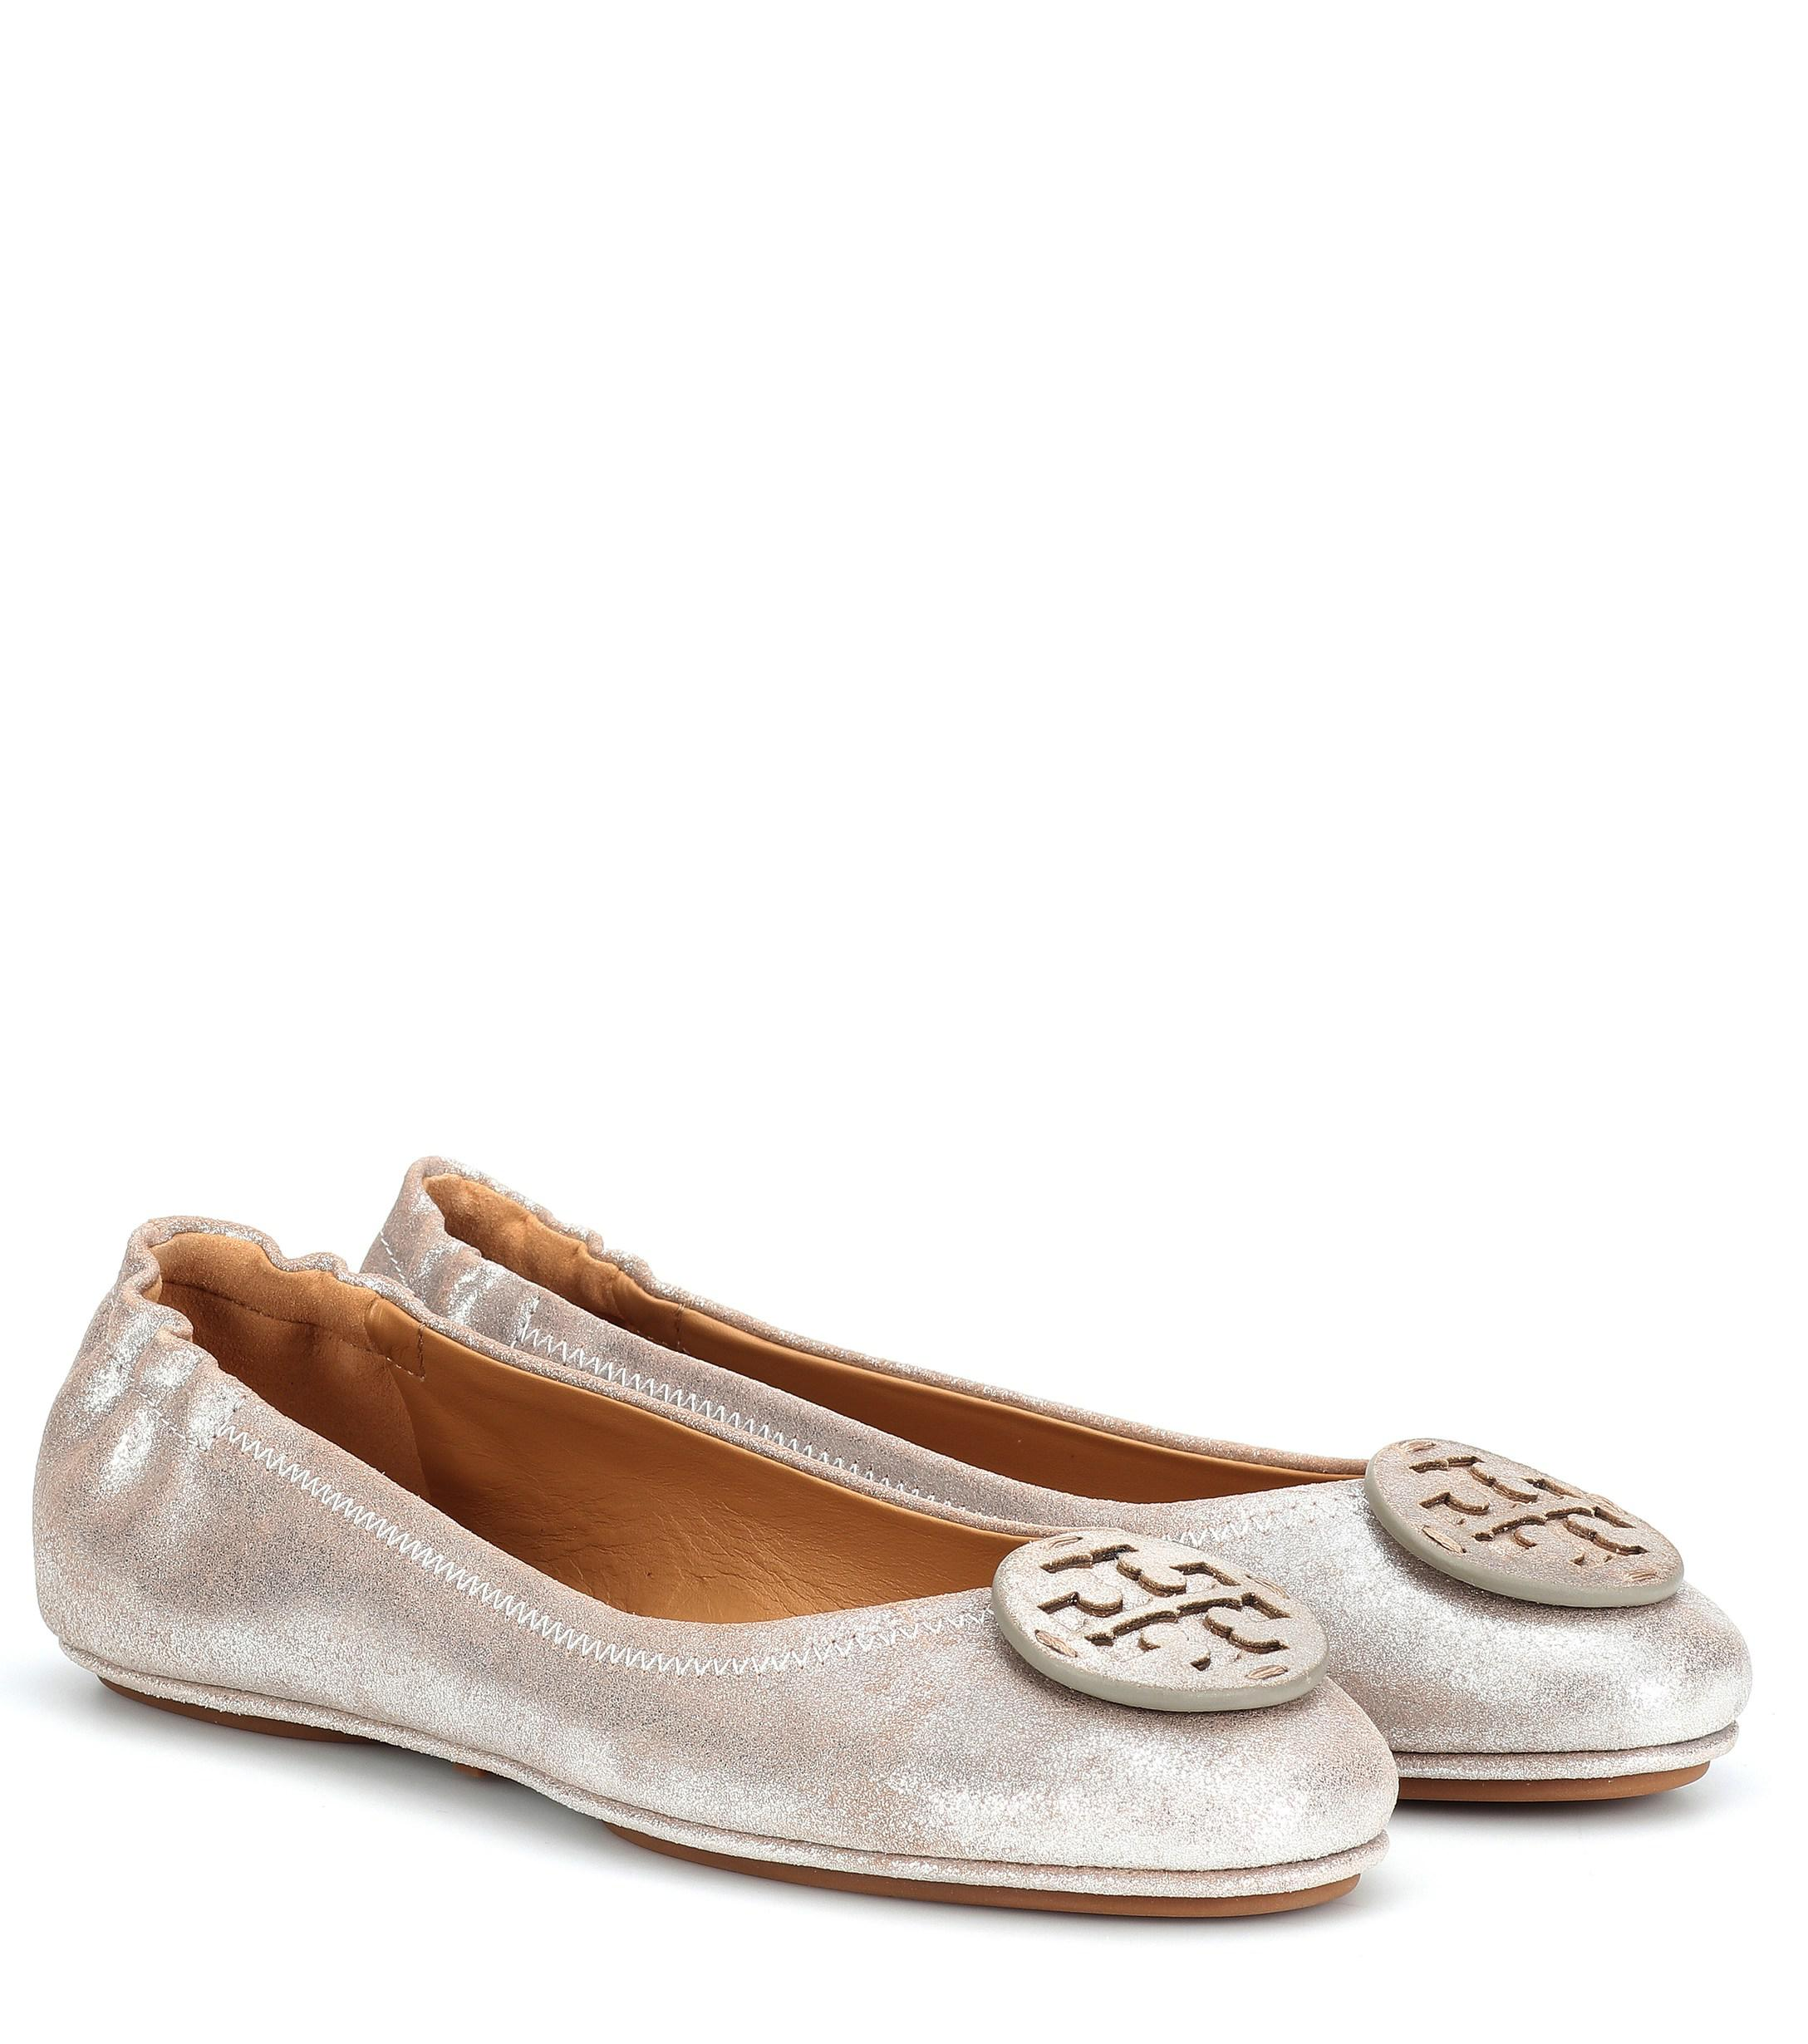 80b5855de Lyst - Tory Burch Minnie Travel Leather Ballet Flats in Metallic